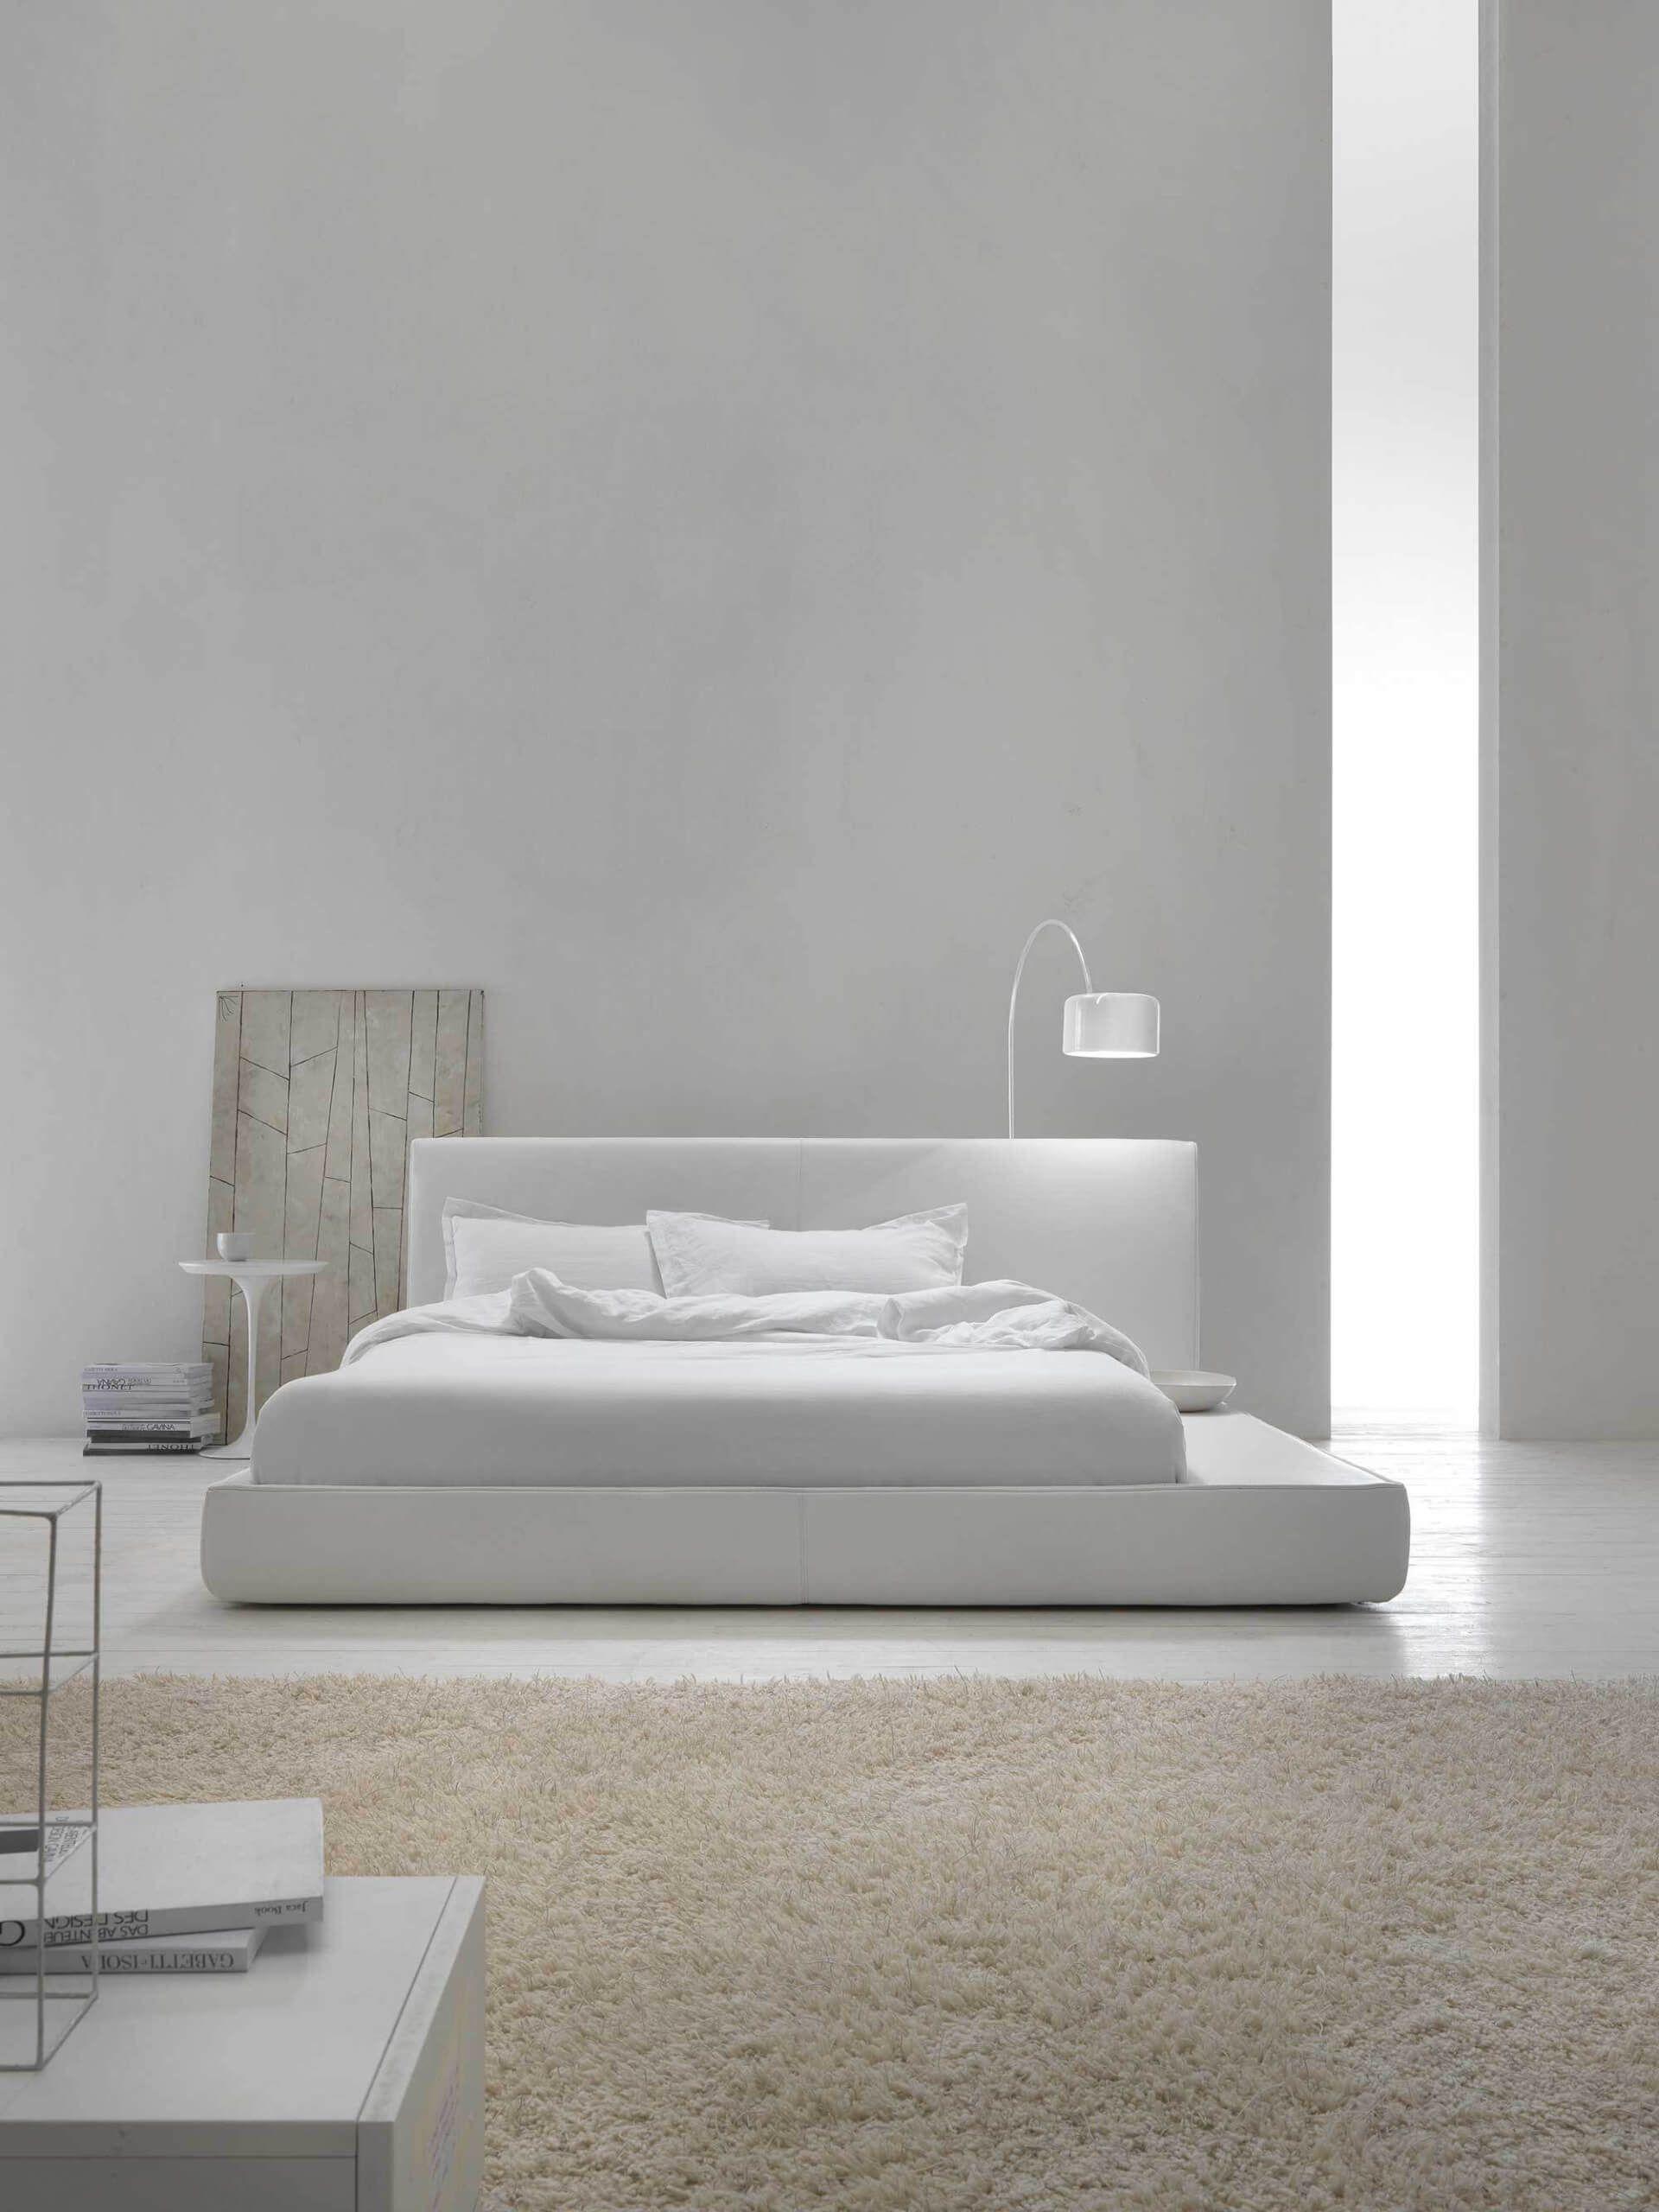 Modern Interiors Inspired By Netflix S Black Mirror Series Modern Minimalist Bedroom Minimalist Bedroom Design Minimalism Interior Modern minimalist bedroom design